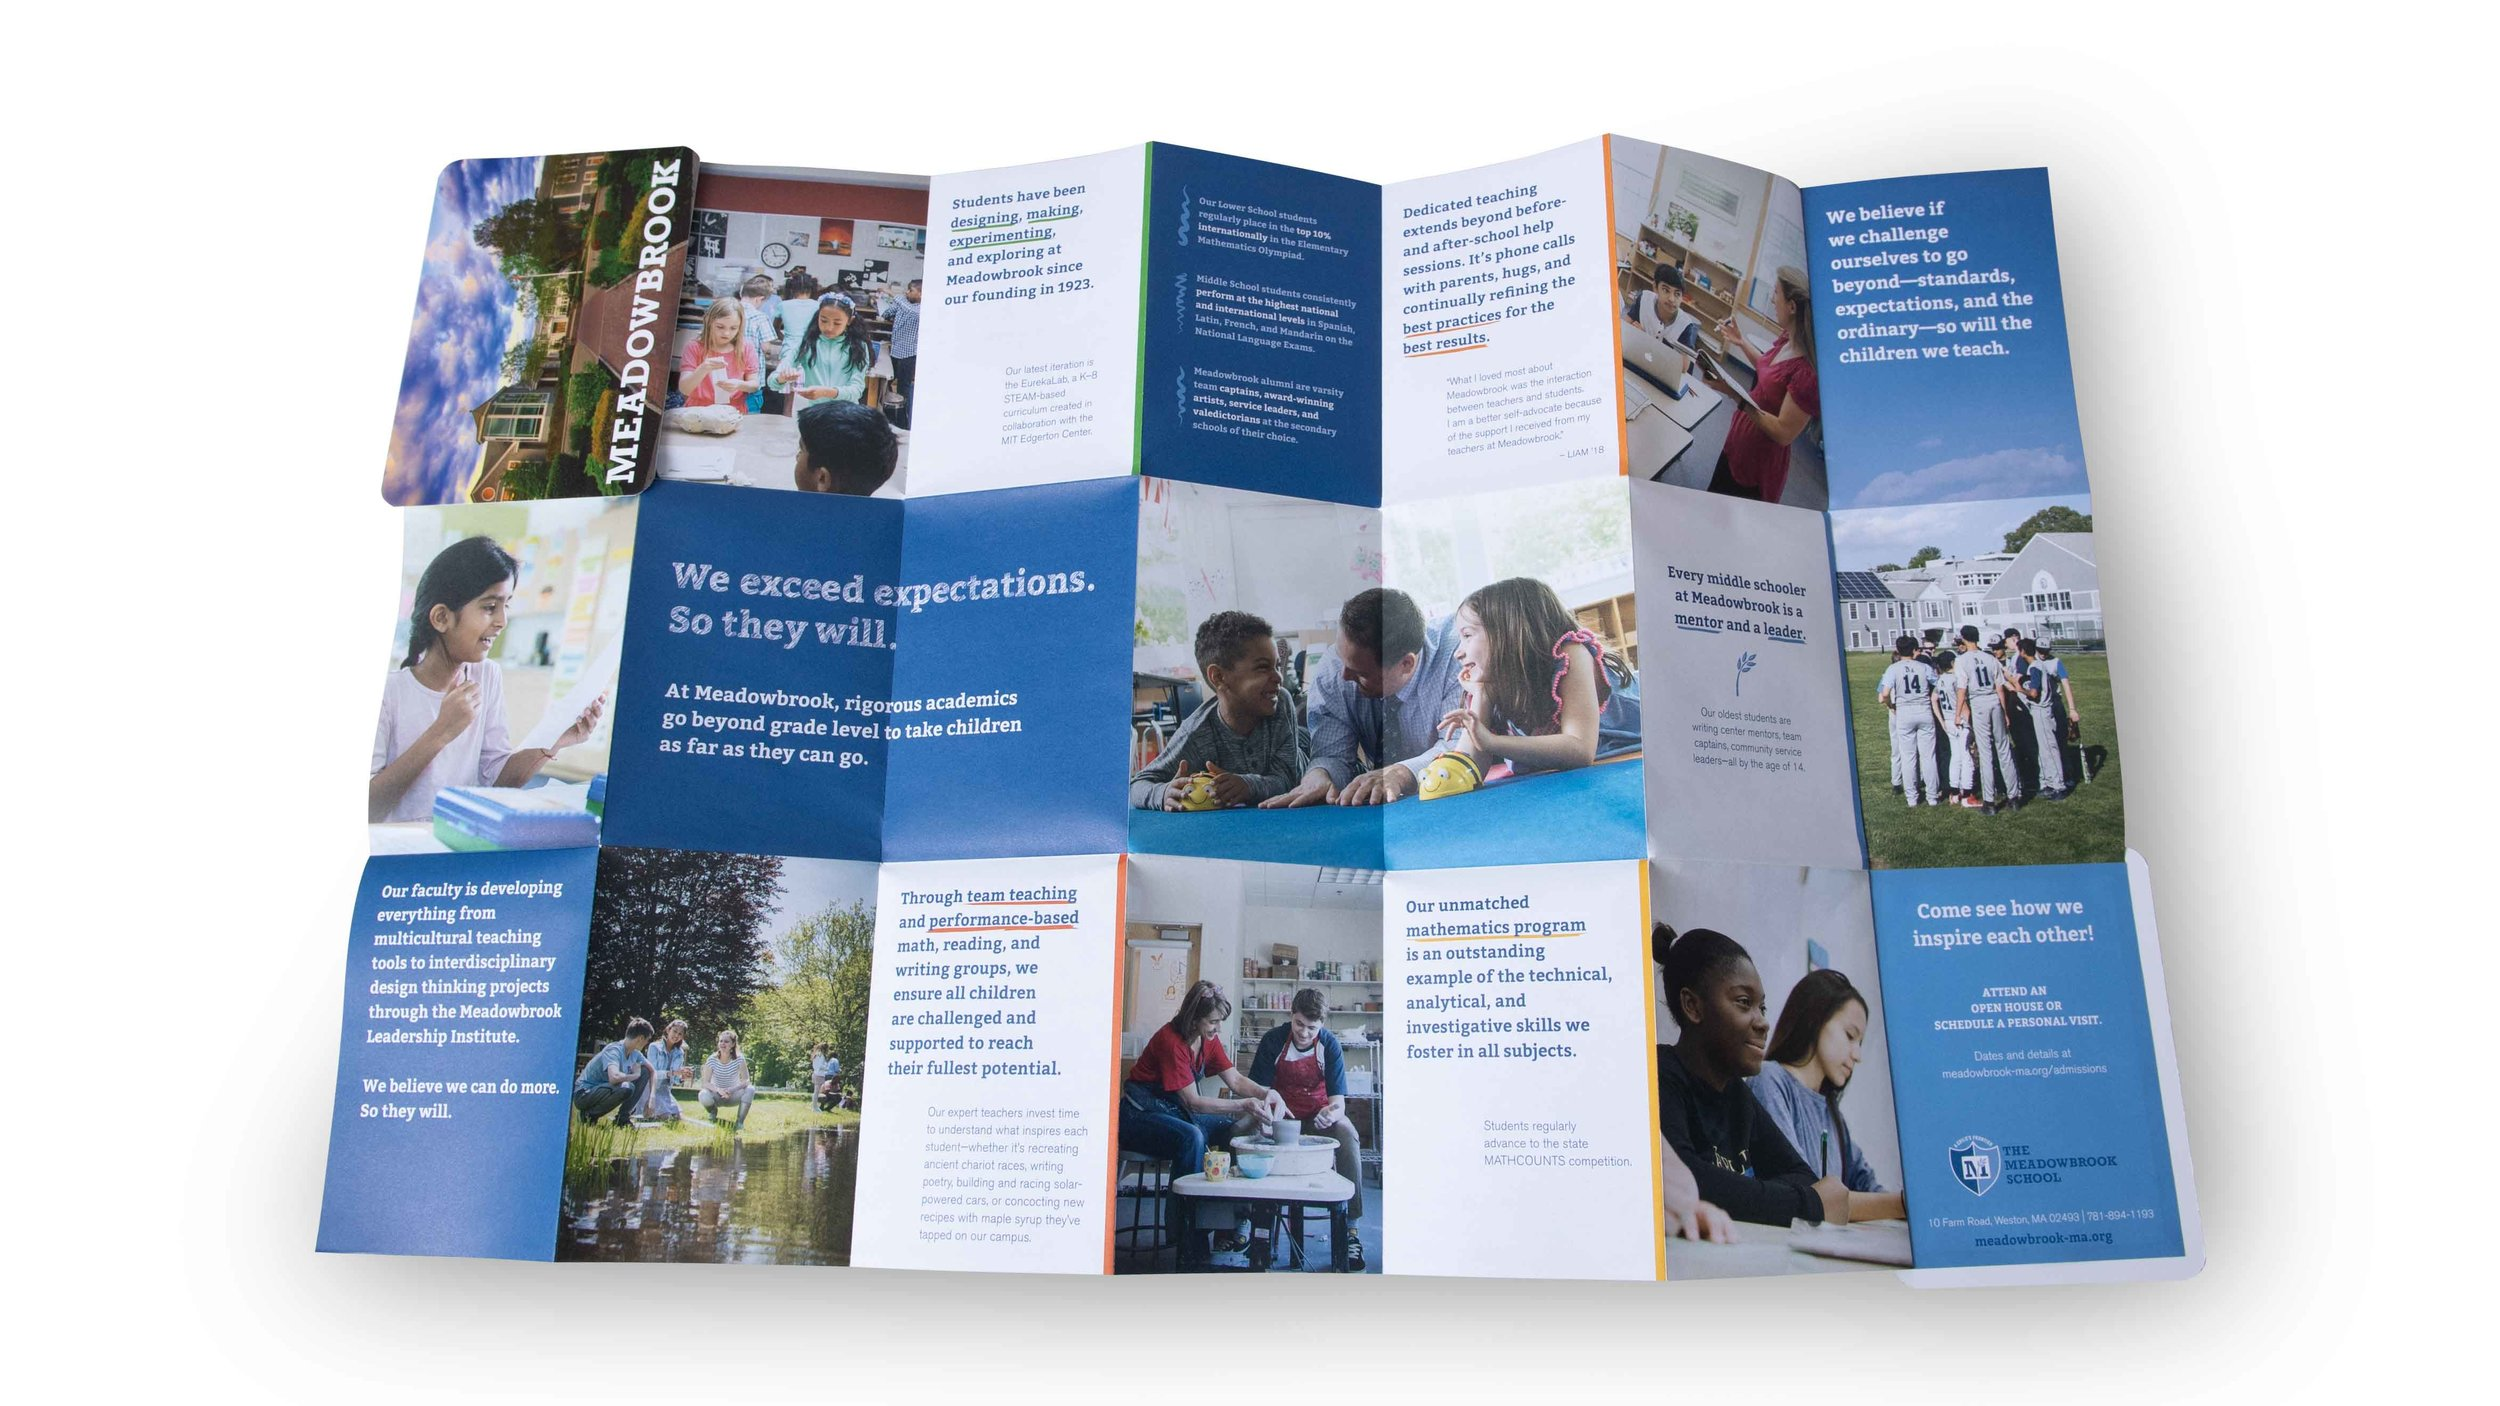 Meadowbrook-School-Creosote-Affects-Travel-Brochure-2.jpg